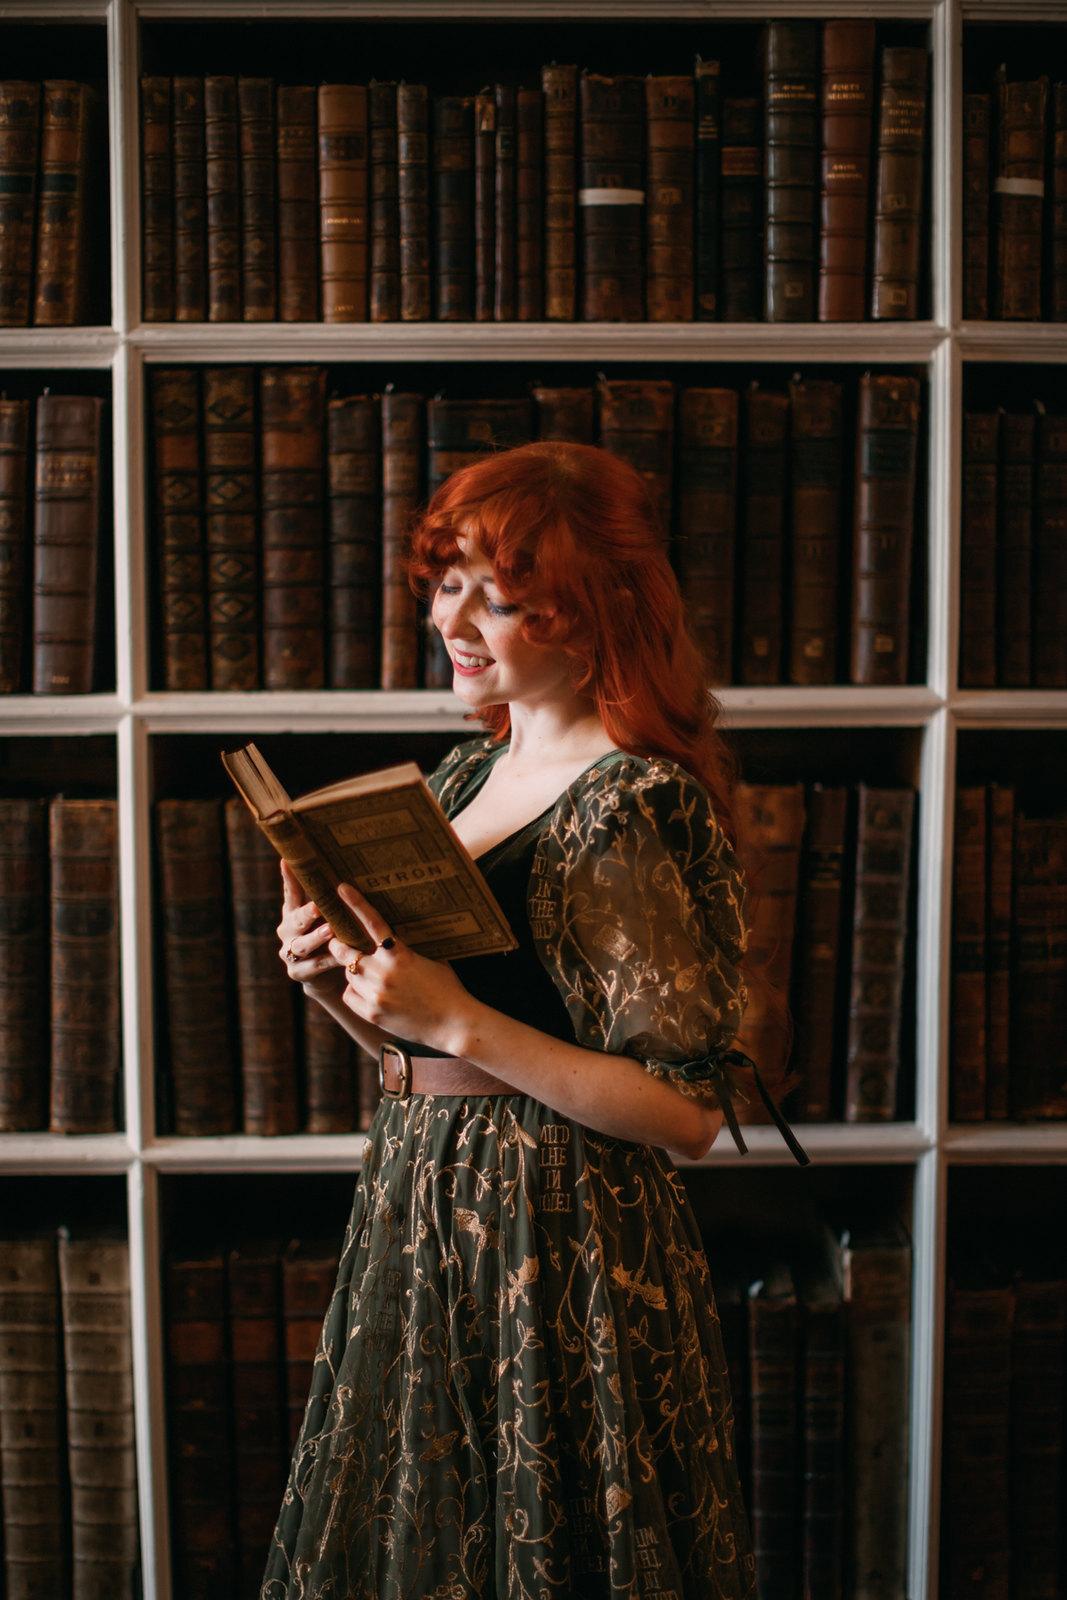 leannan sidhe, nour and the merchant, bookworm dress, main character dress, enemies to lovers dress, fairytale dress, fairycore dress, magic dress, dragon dress, book dress, bookish dress